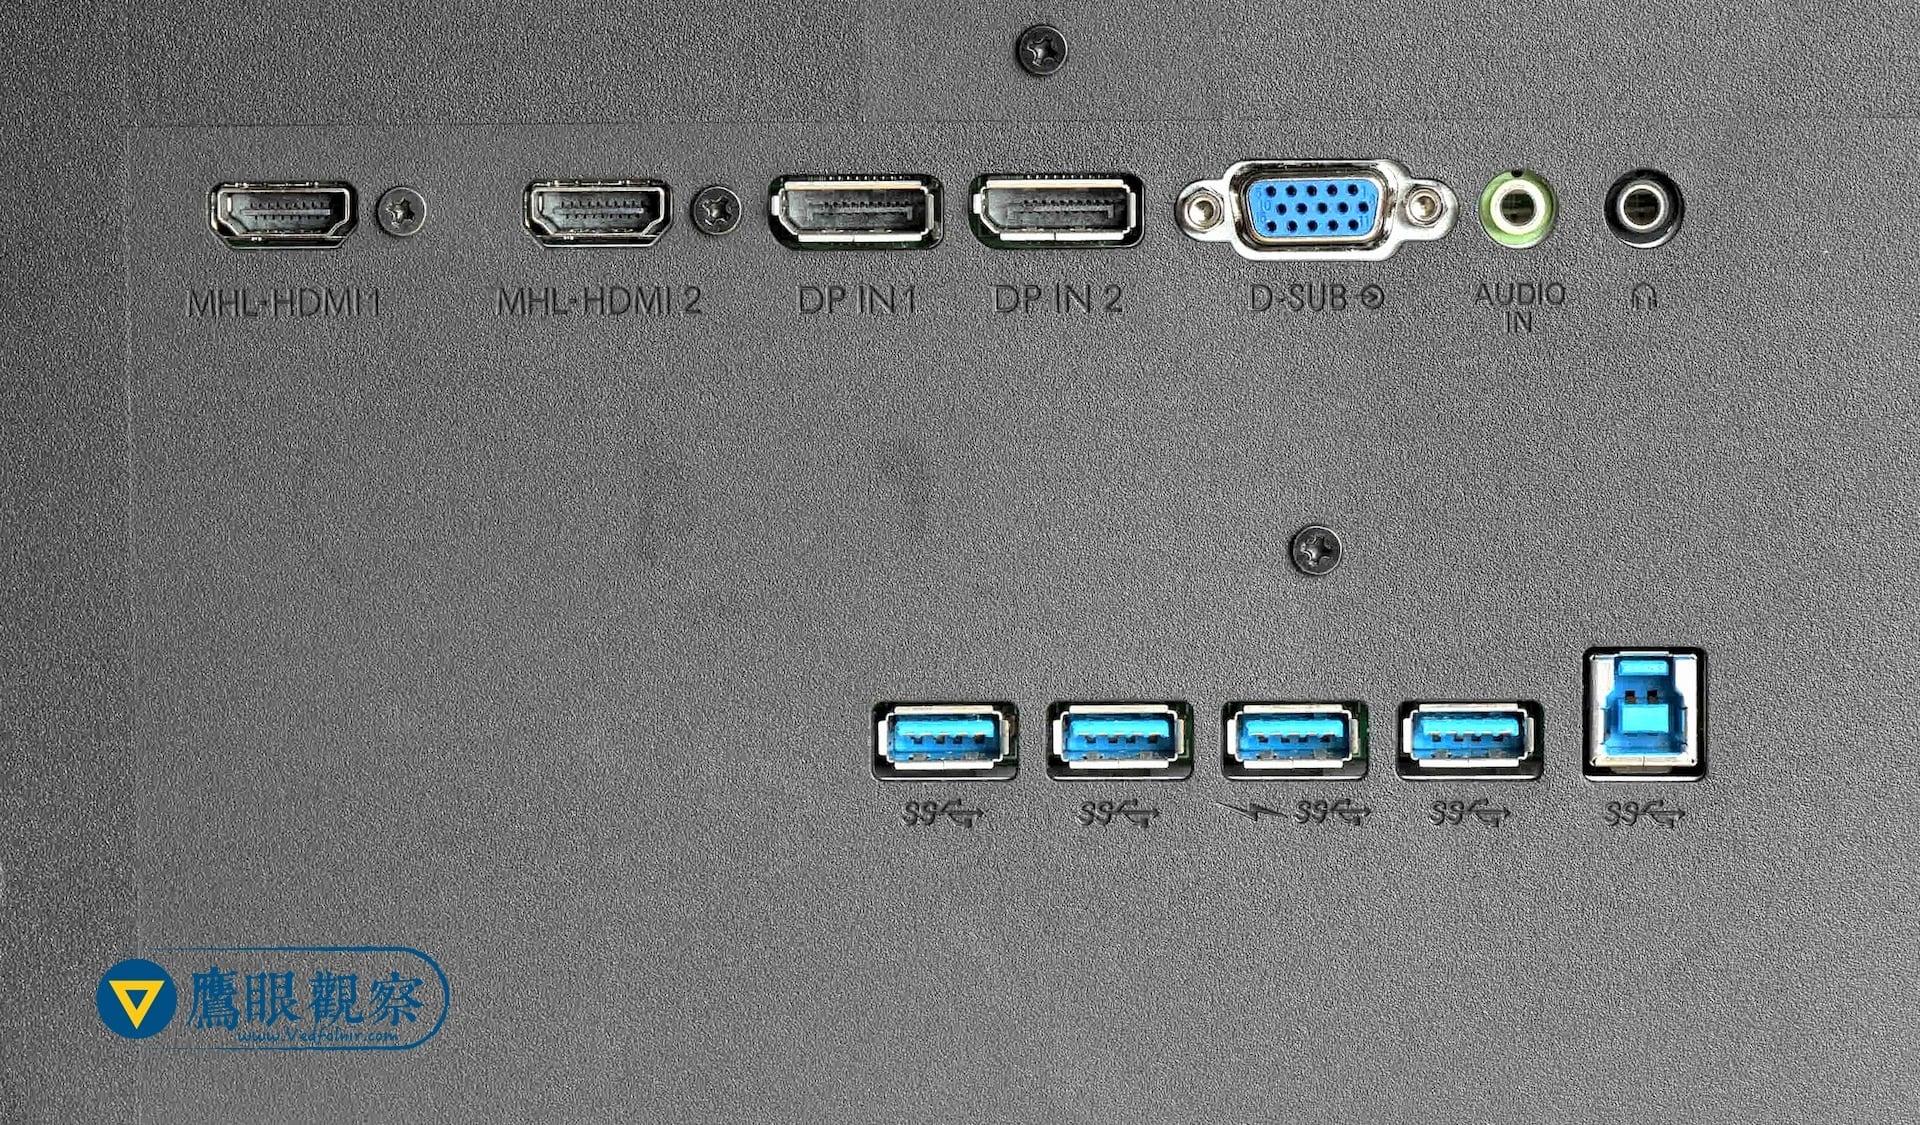 電腦螢幕選購要注意的事:LCD背面的USB擴充孔 usb port extender behind lcd monitor Philips 43 BDM4350UC